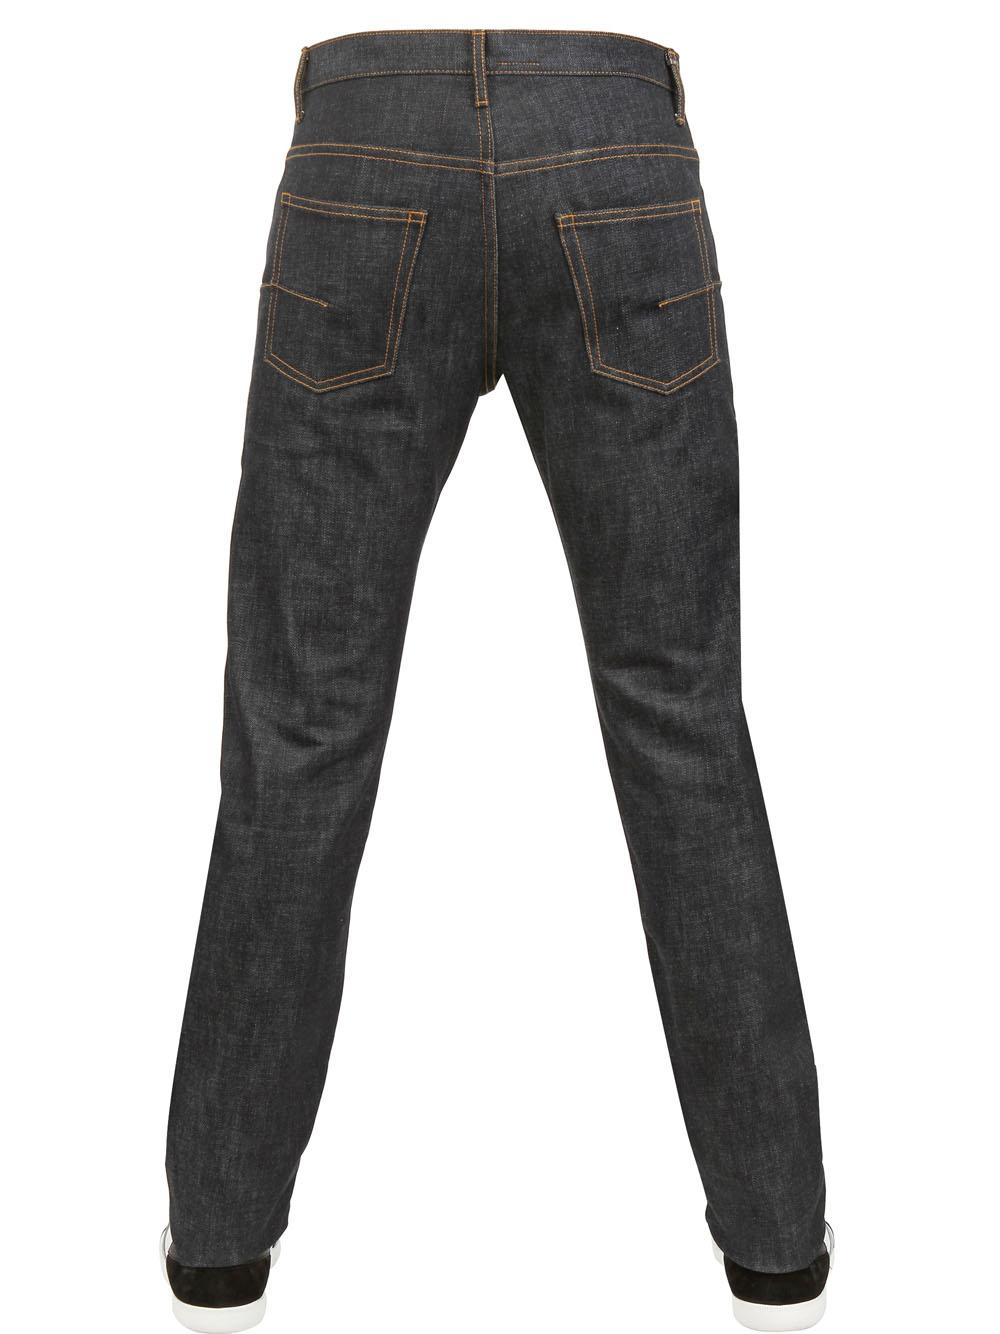 6942fc78906 Brut Denim Dior in Lyst for Jeans Men 19cm Blue Homme wtRanqx6S